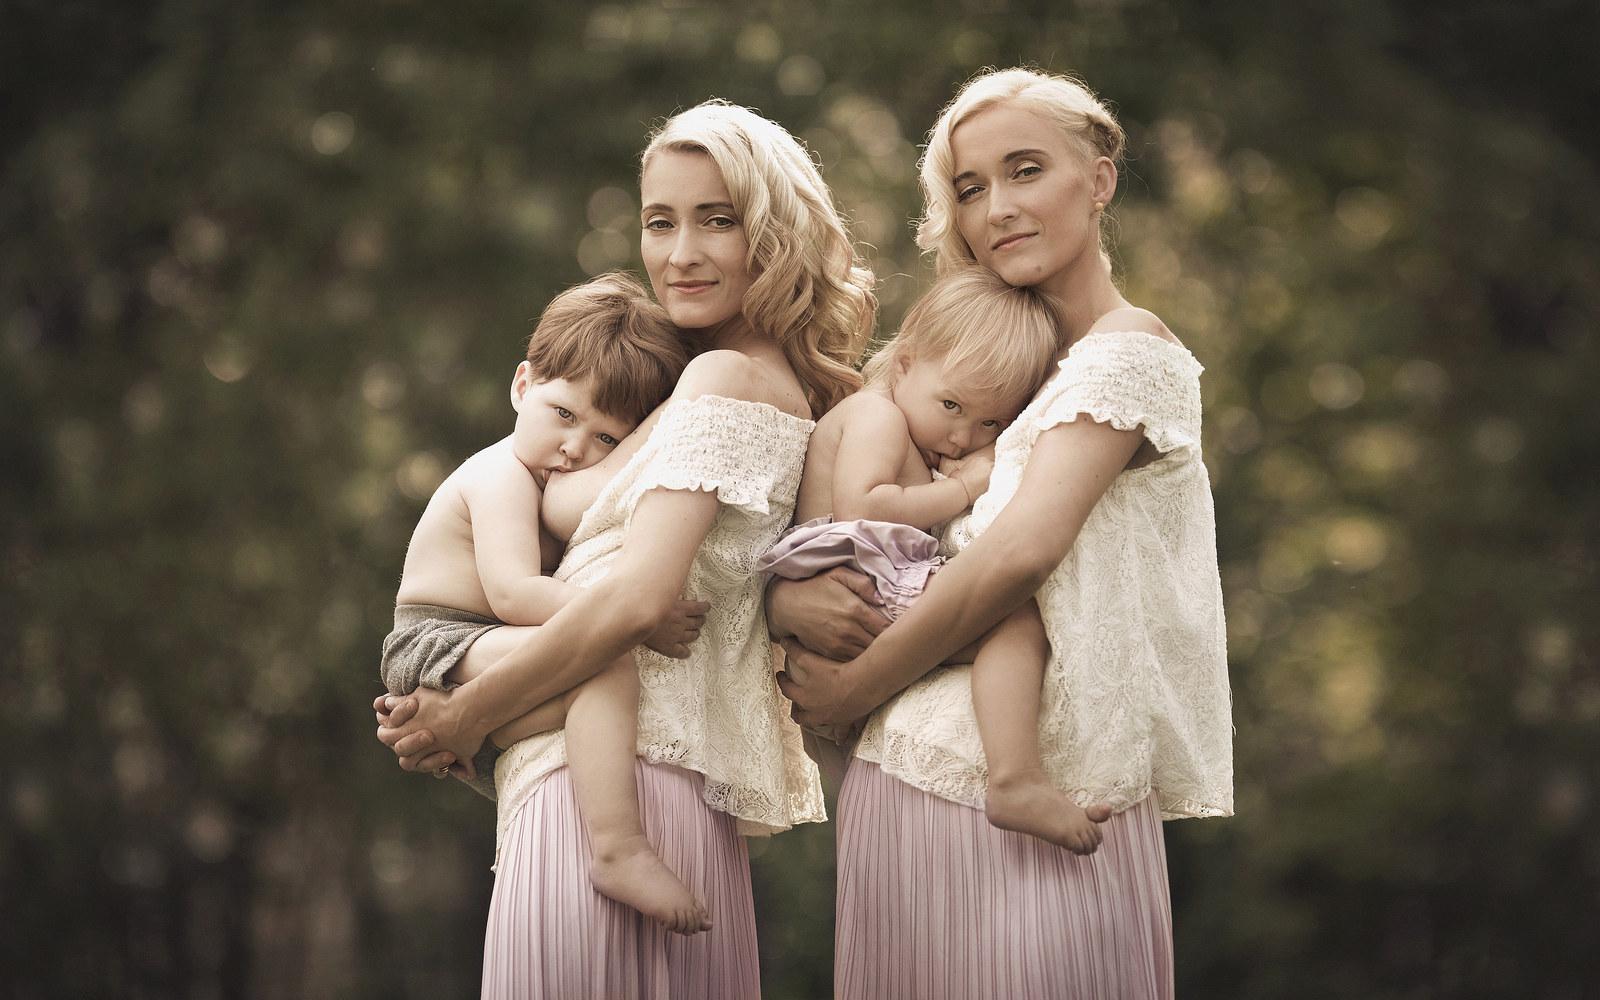 Breastfeeding in public? - 向阳英语教育 - 向阳英语教育的博客